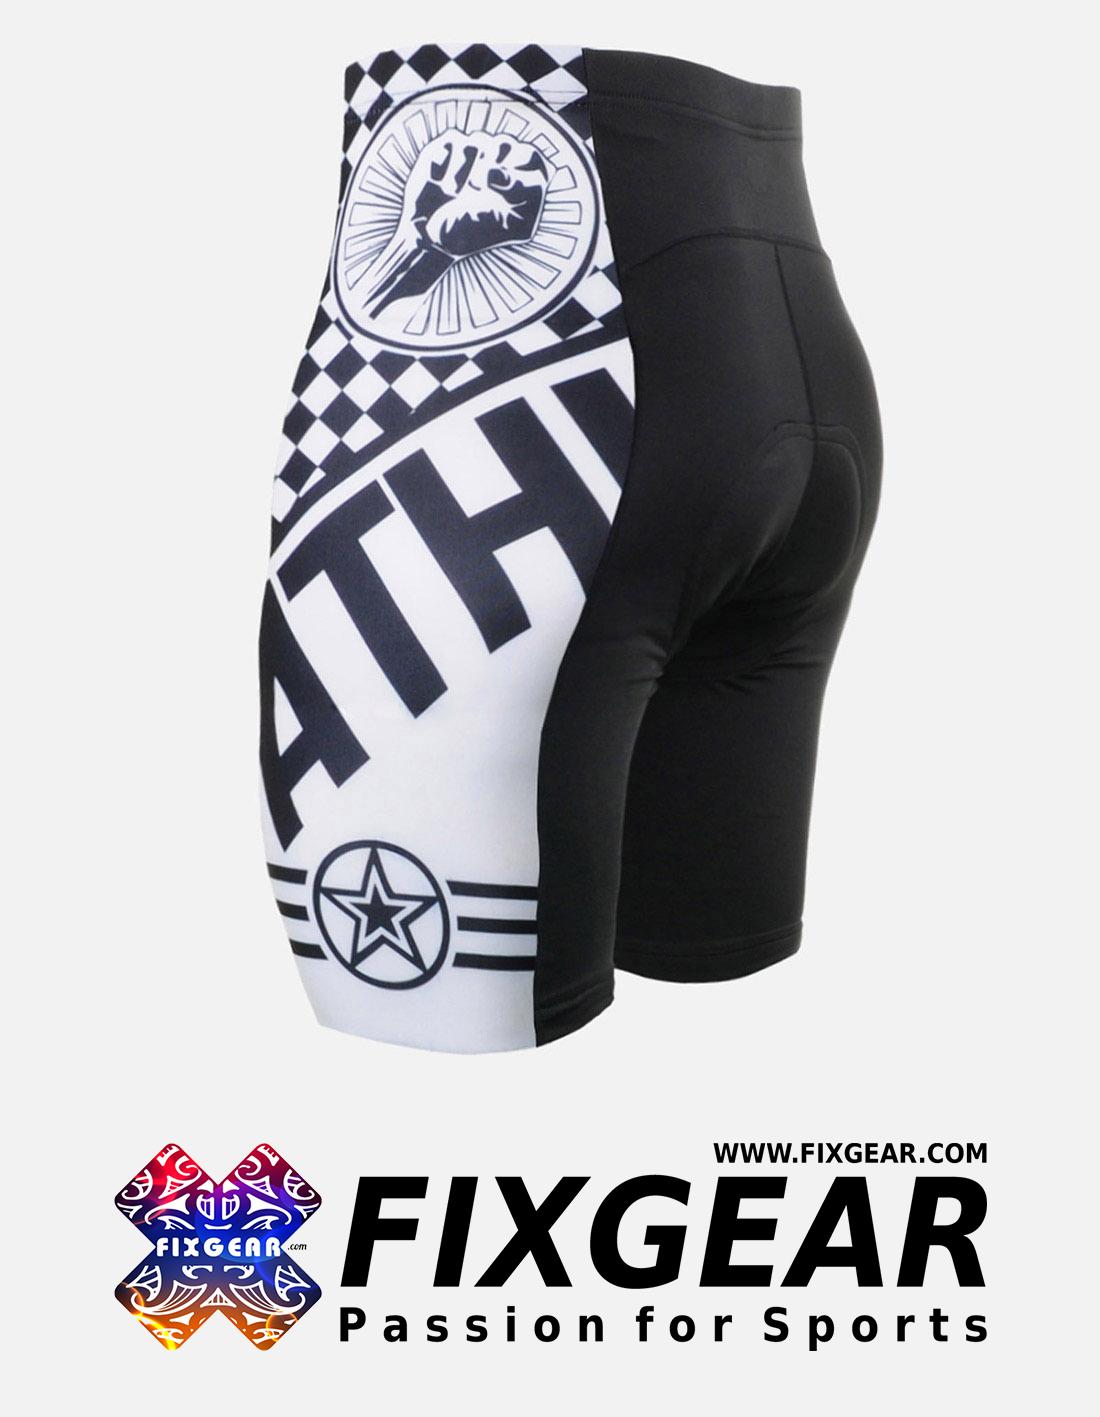 FIXGEAR ST-W6 Women's Cycling Padded Shorts